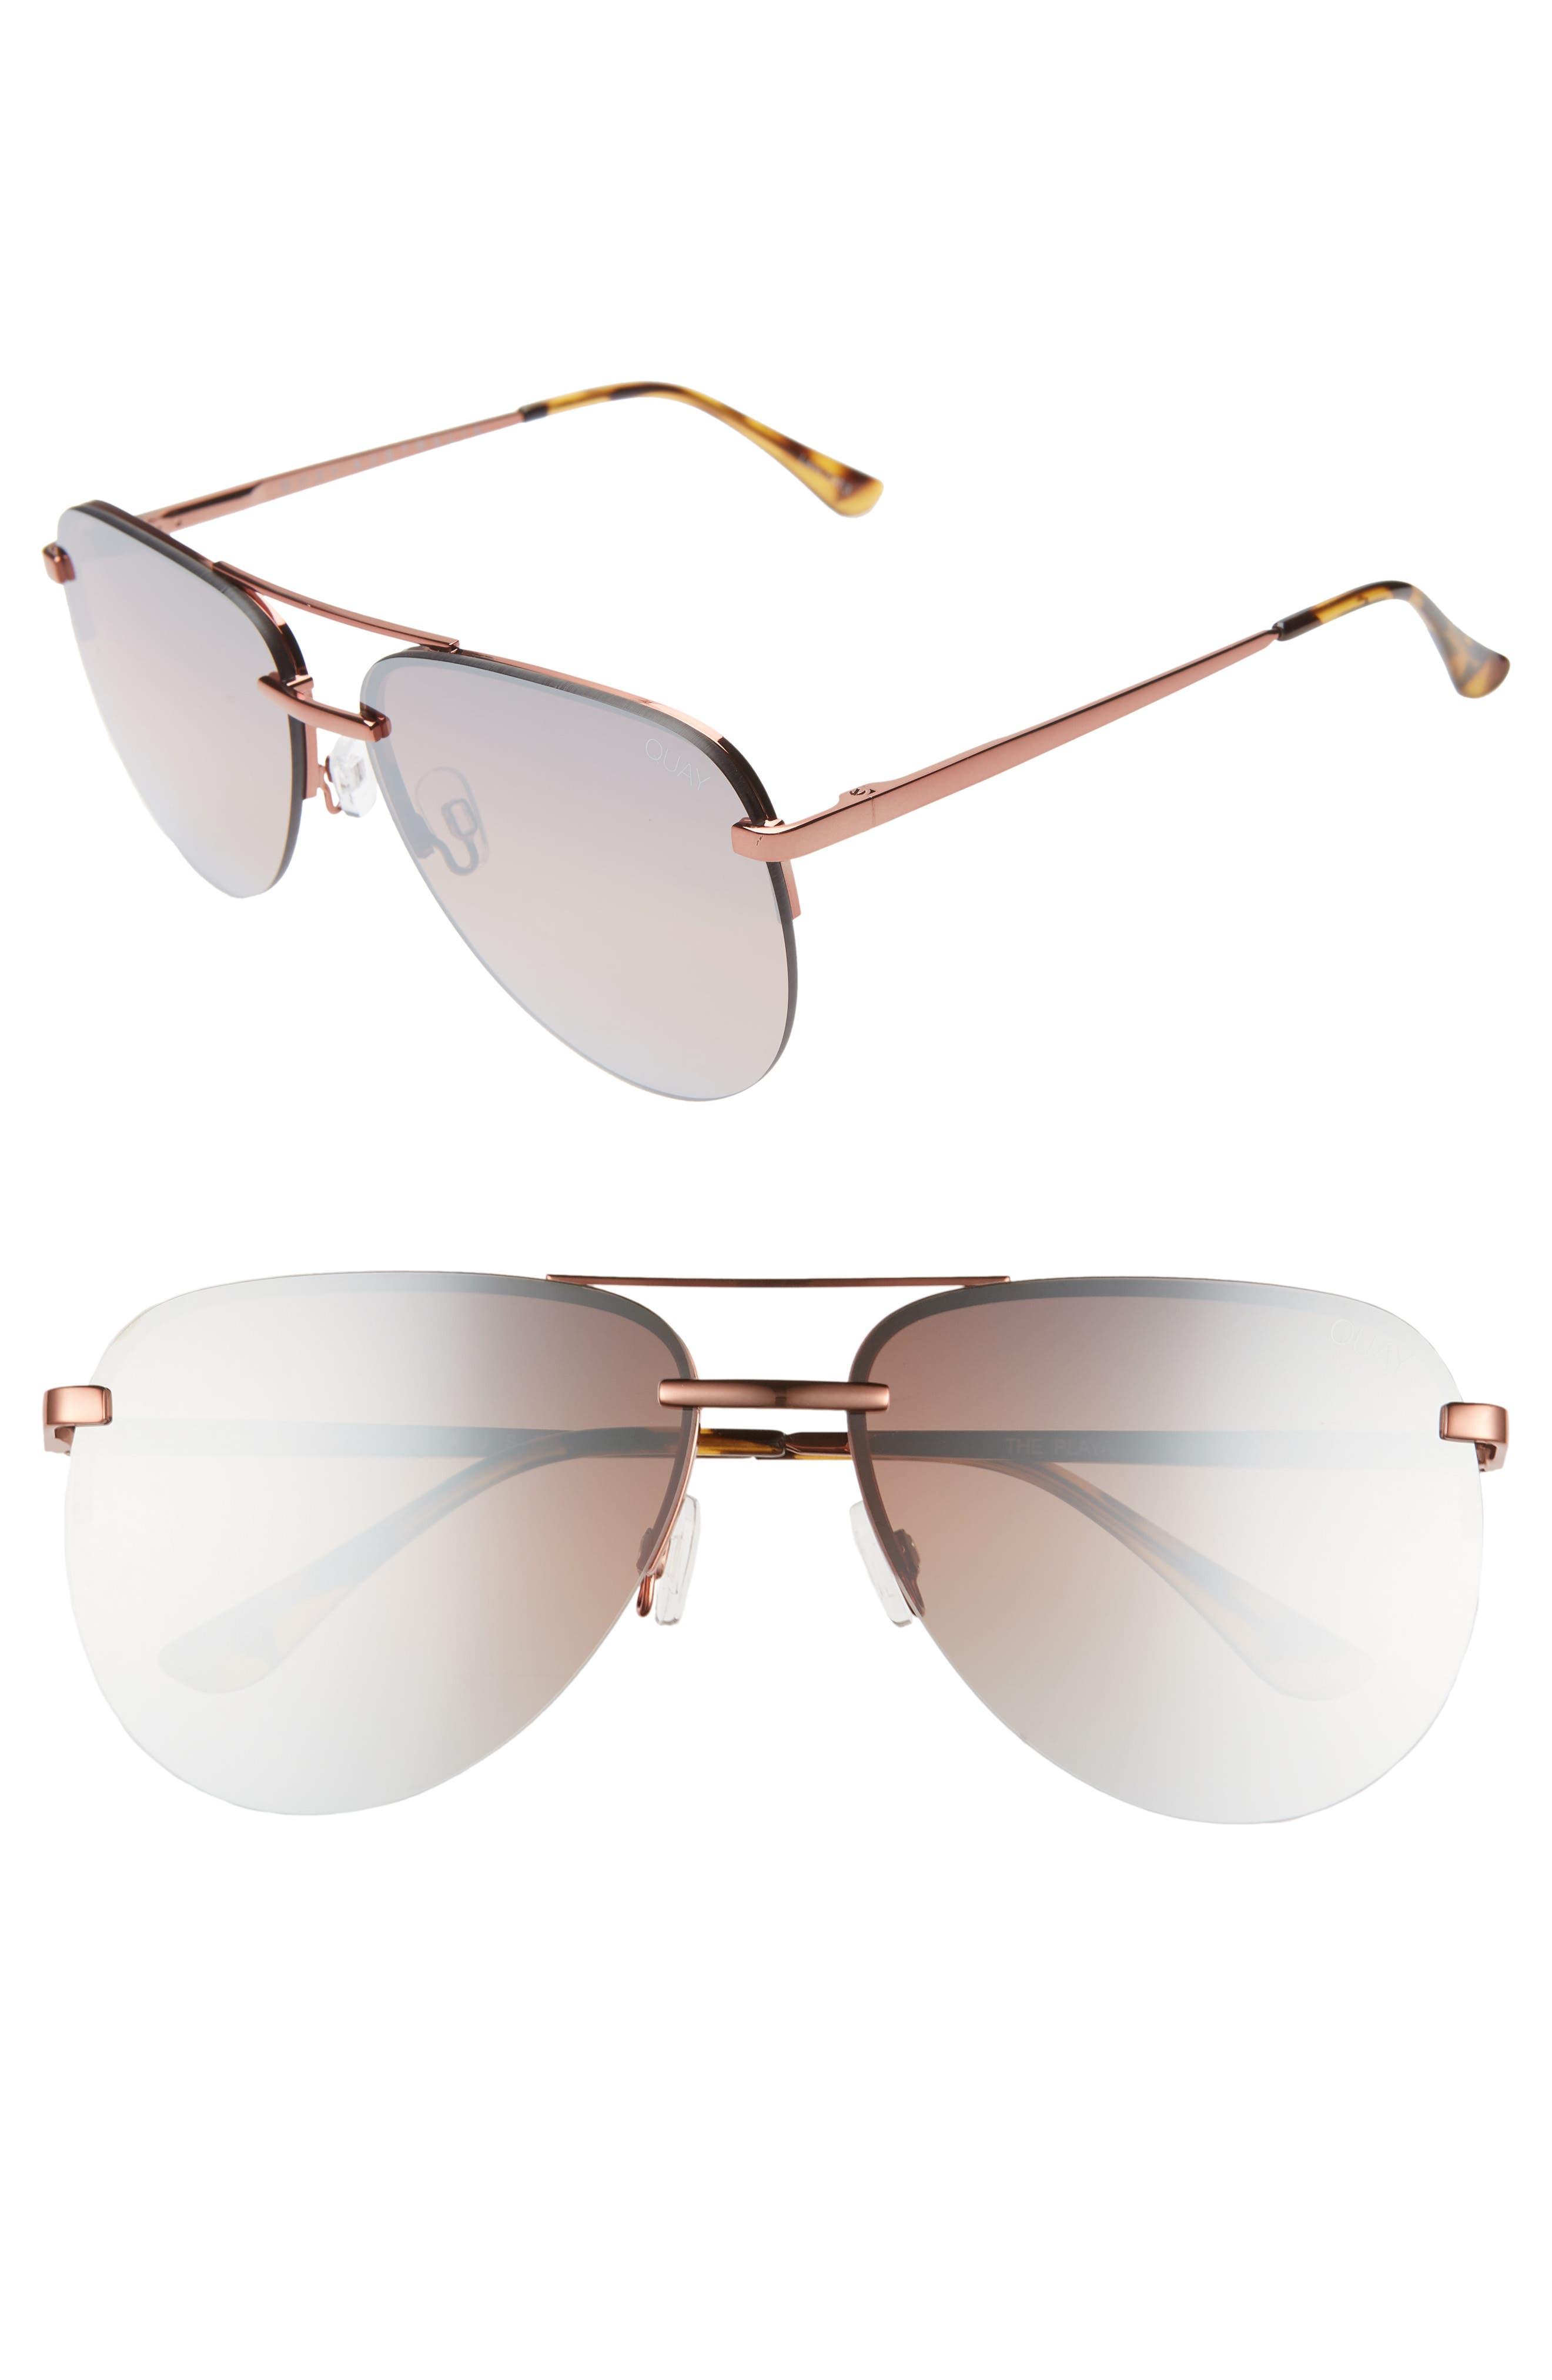 QUAY AUSTRALIA x JLO The Playa 54mm Aviator Sunglasses, Main, color, BRONZE/ BROWN